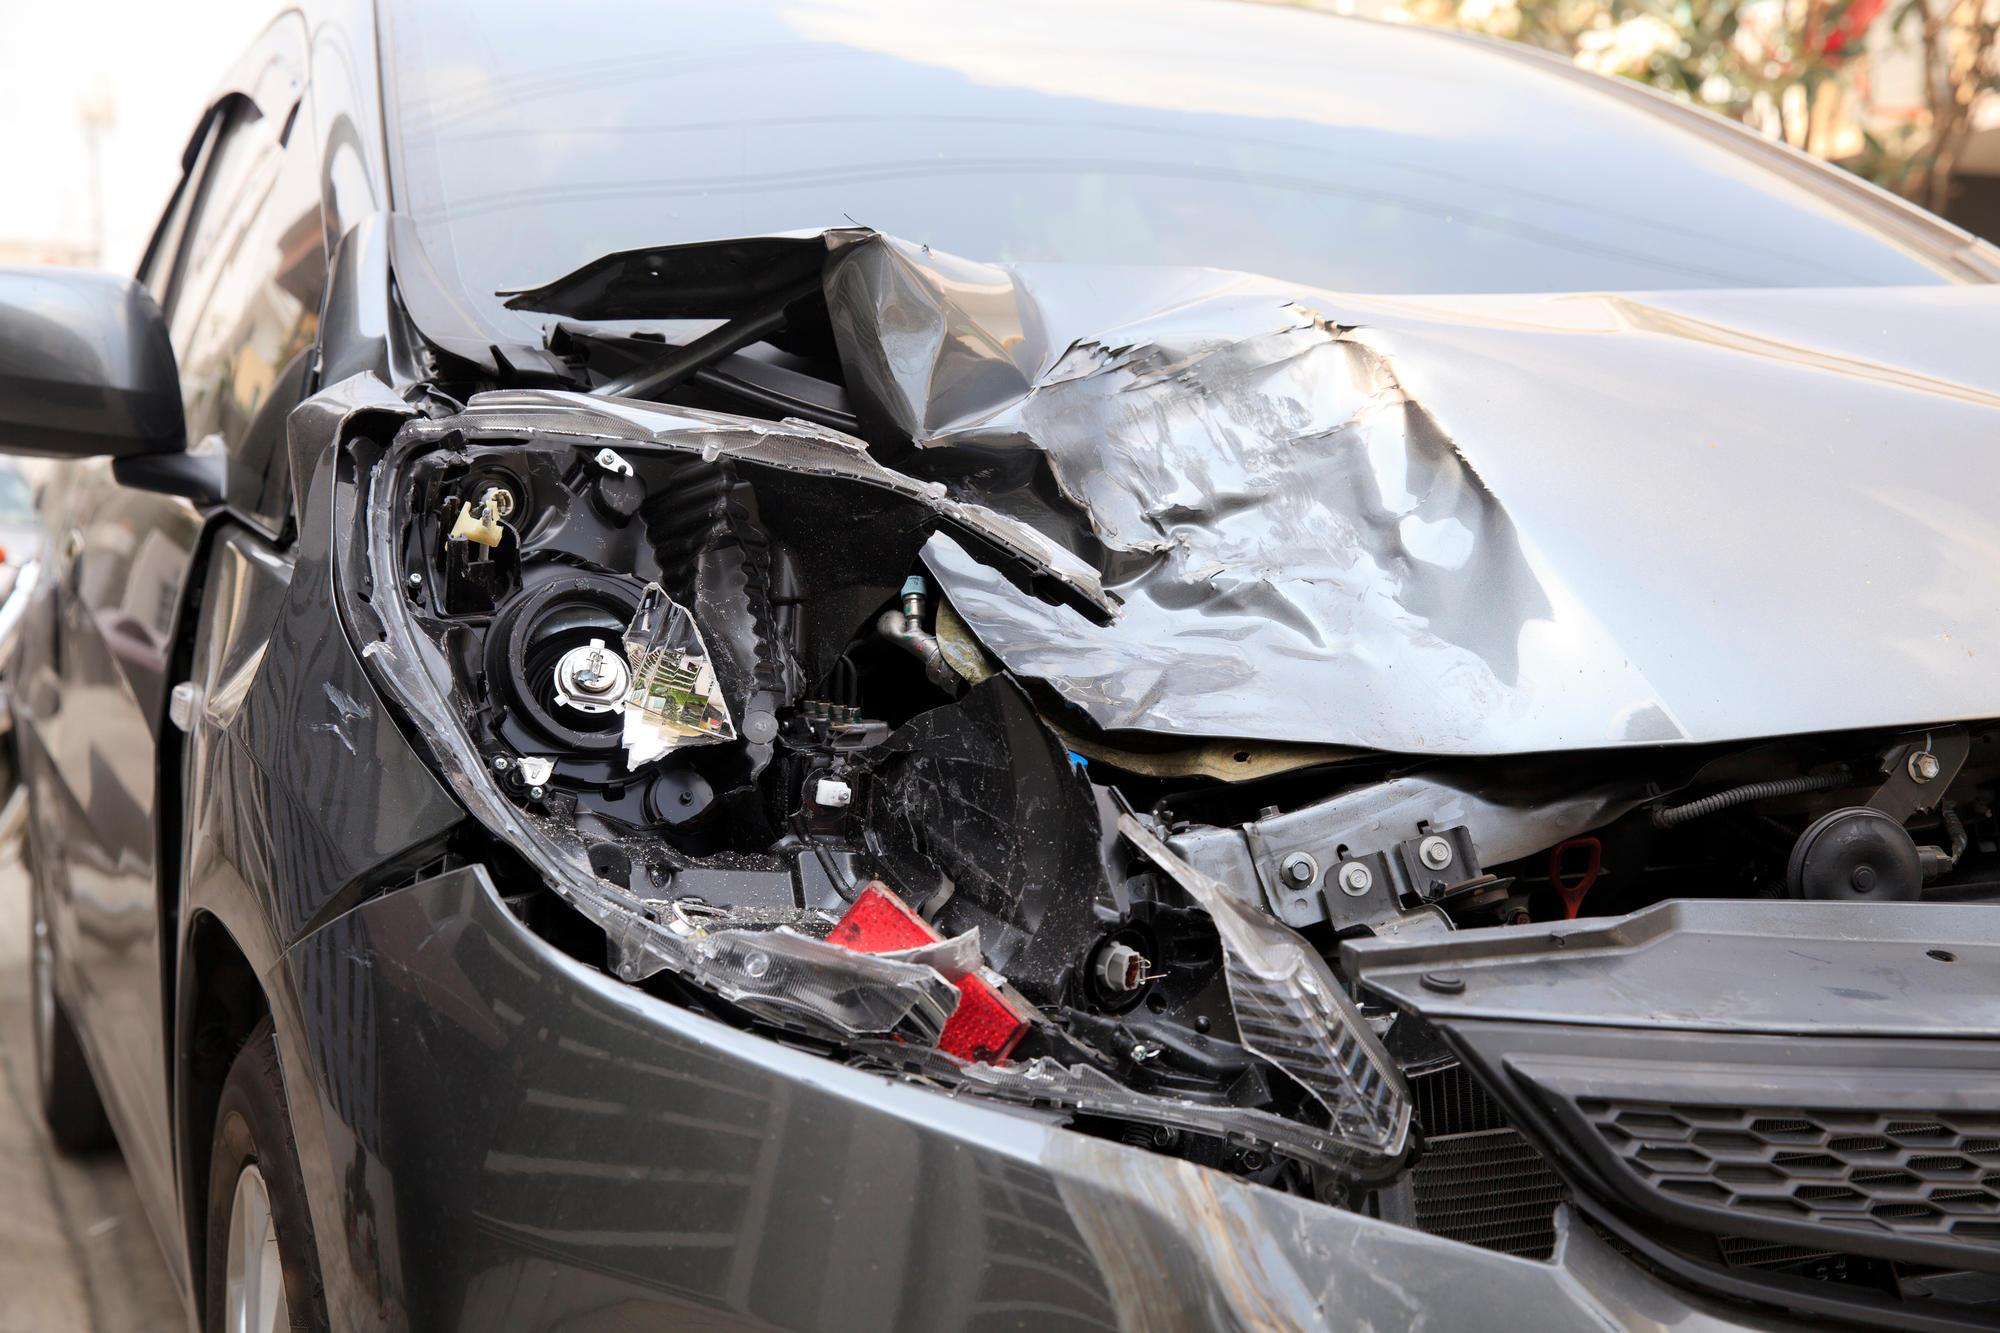 Goosehead Insurance - Andrew Haley image 2